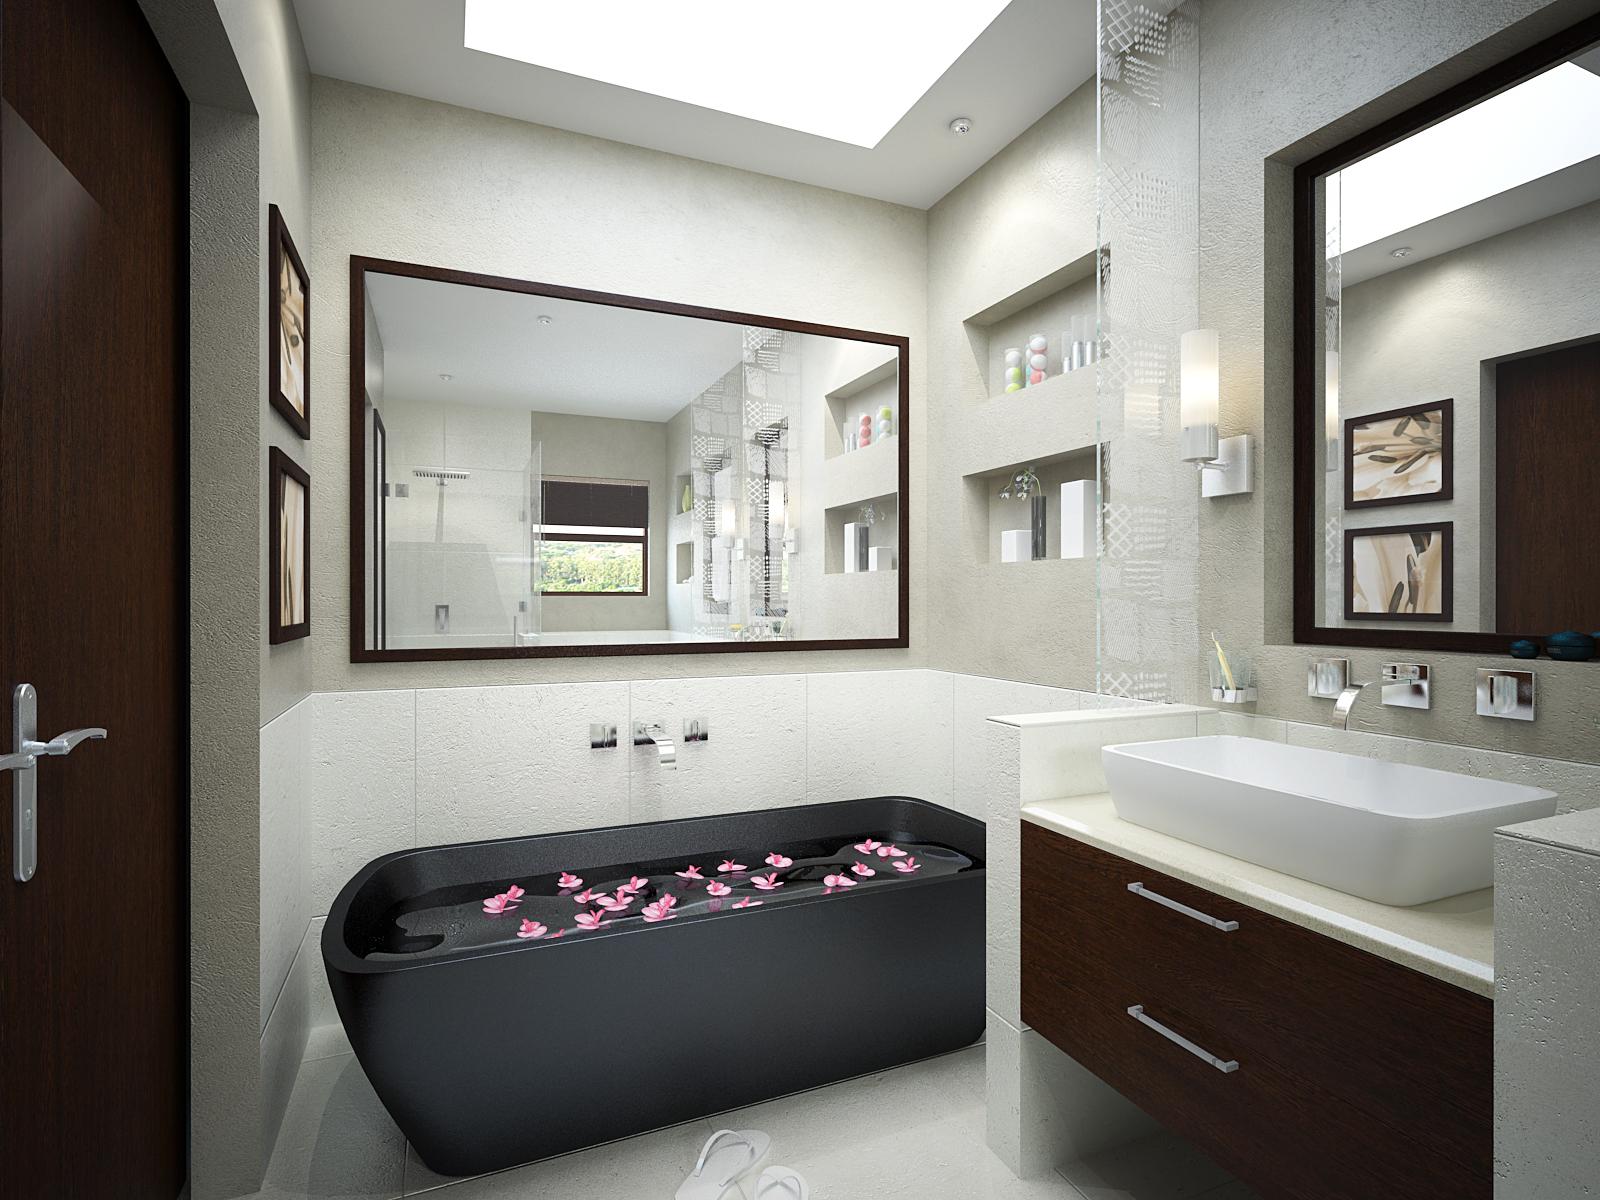 The Top 20 Small Bathroom Design Ideas for 2014 - Qnud on Contemporary Small Bathroom Ideas  id=49479